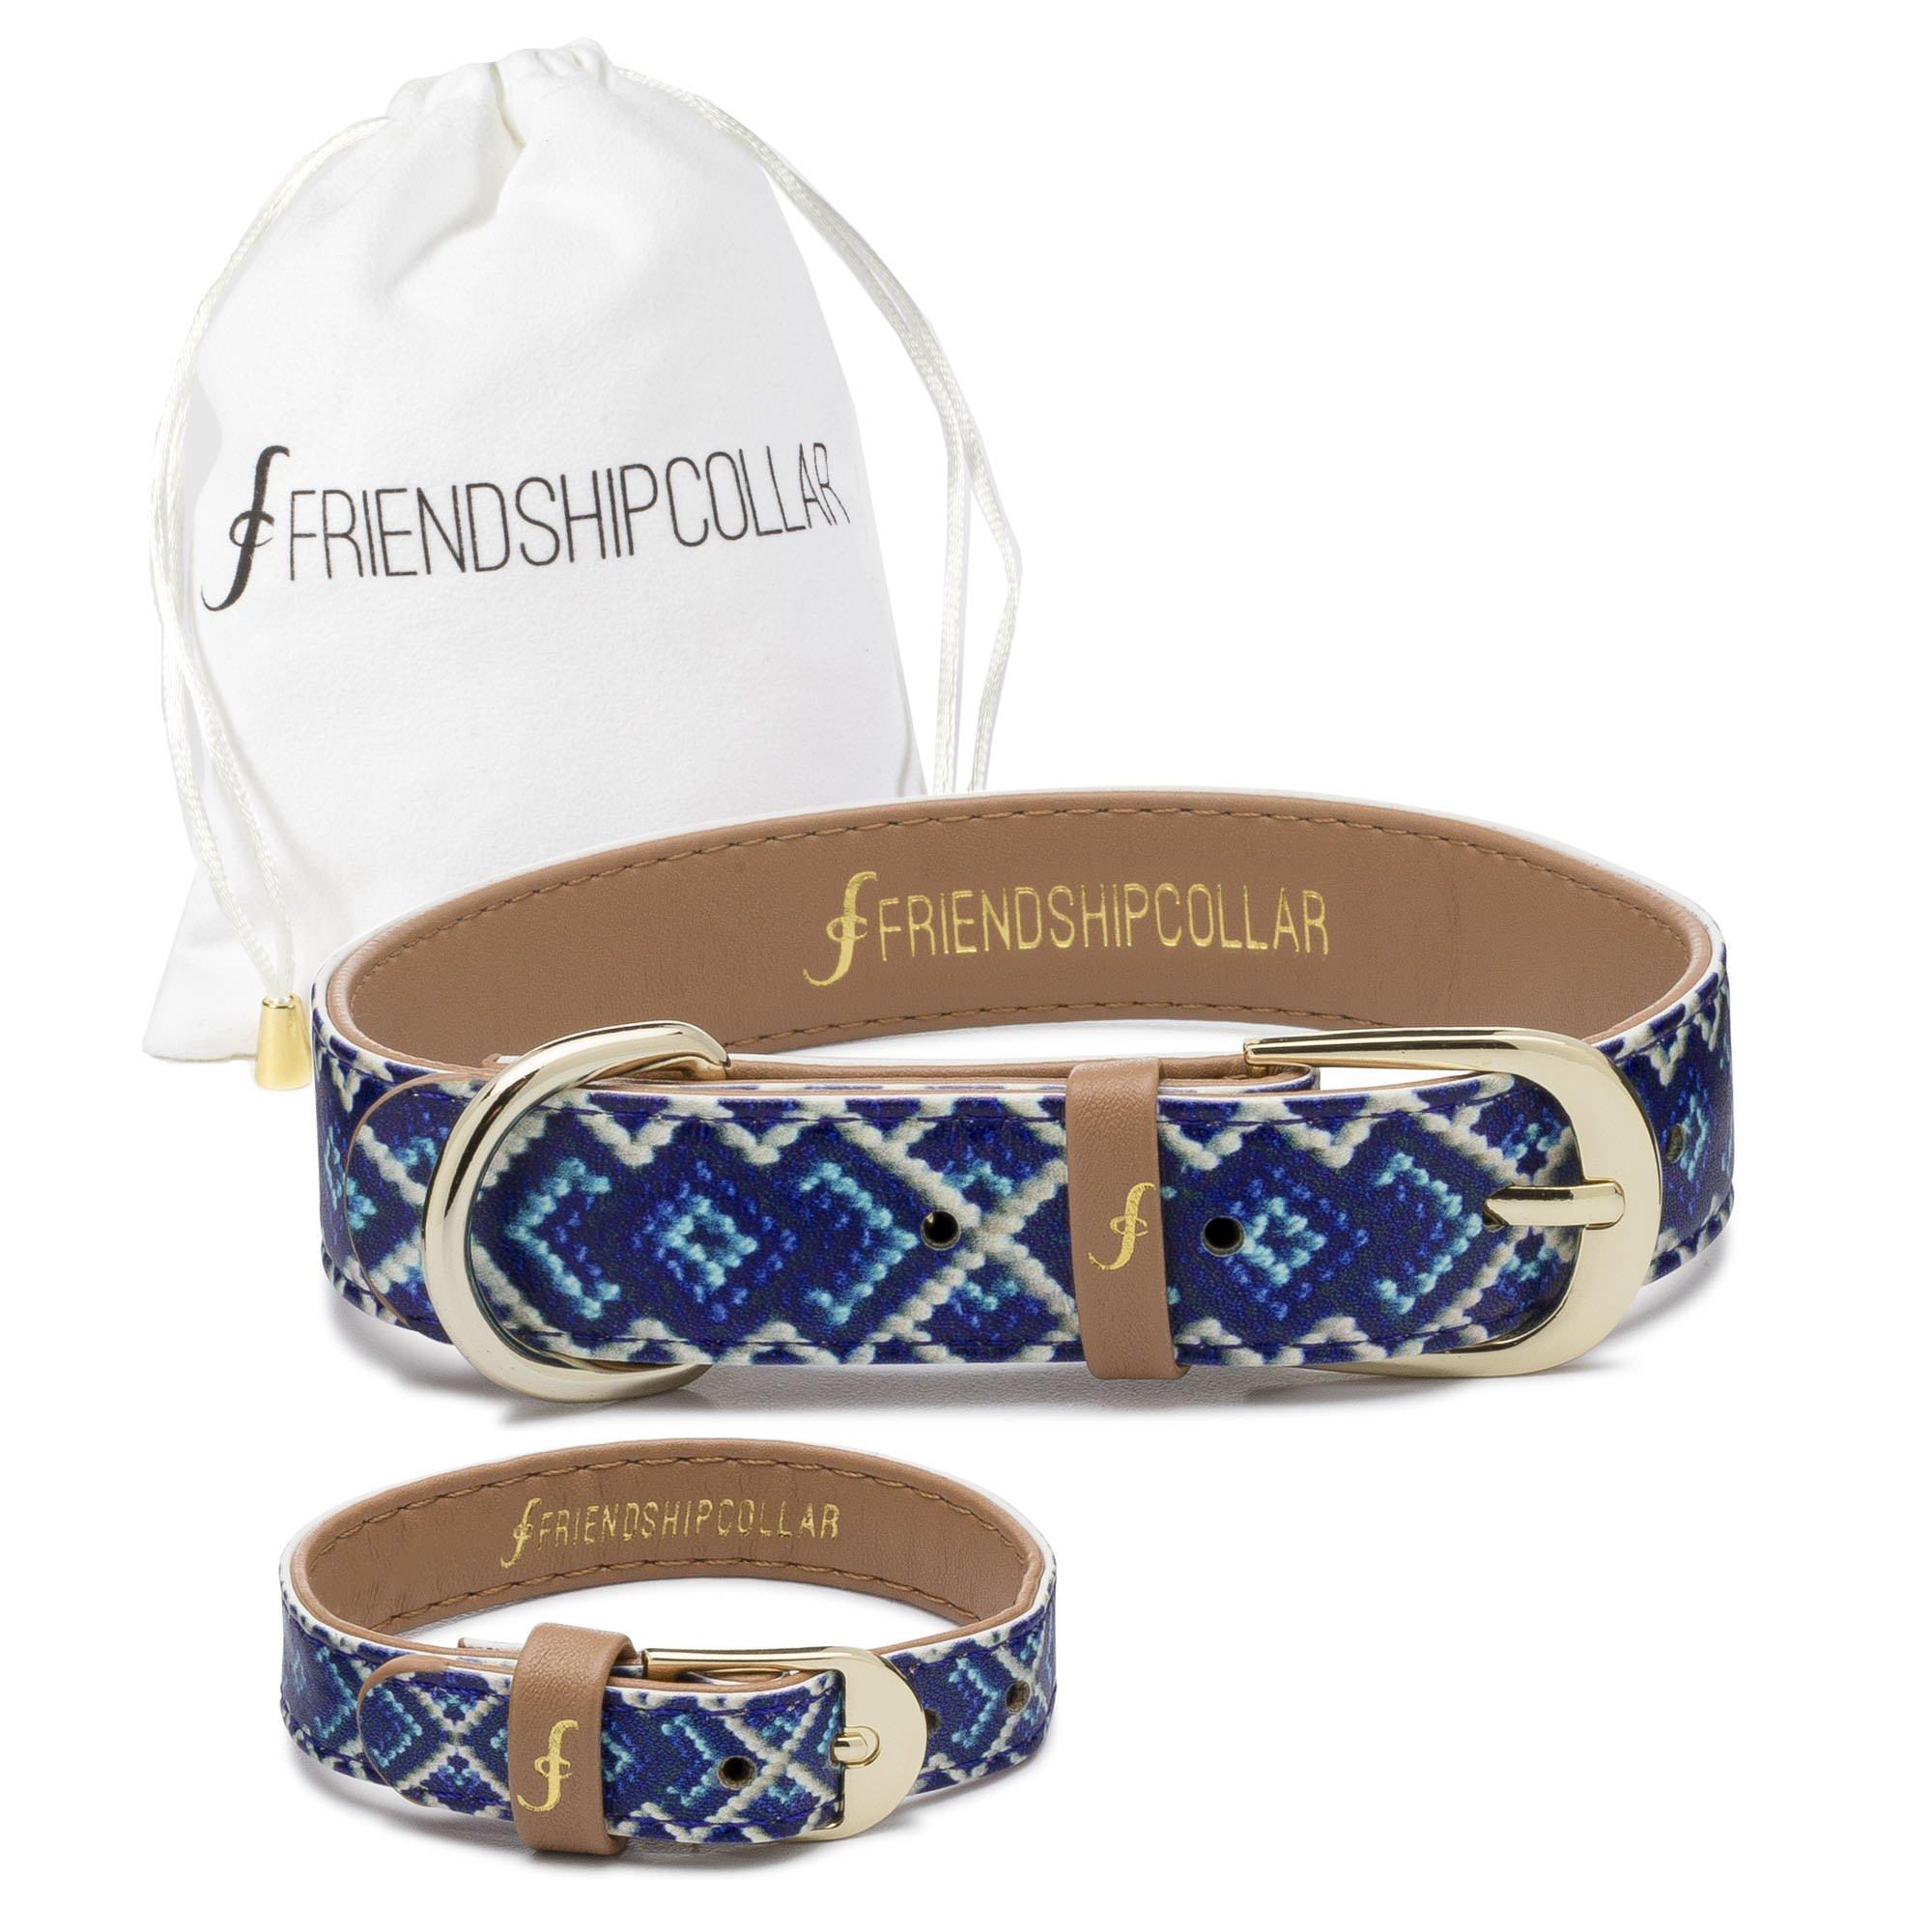 FriendshipCollar Dog Collar and Friendship Bracelet - The Mucky Pup - Medium by FriendshipCollar